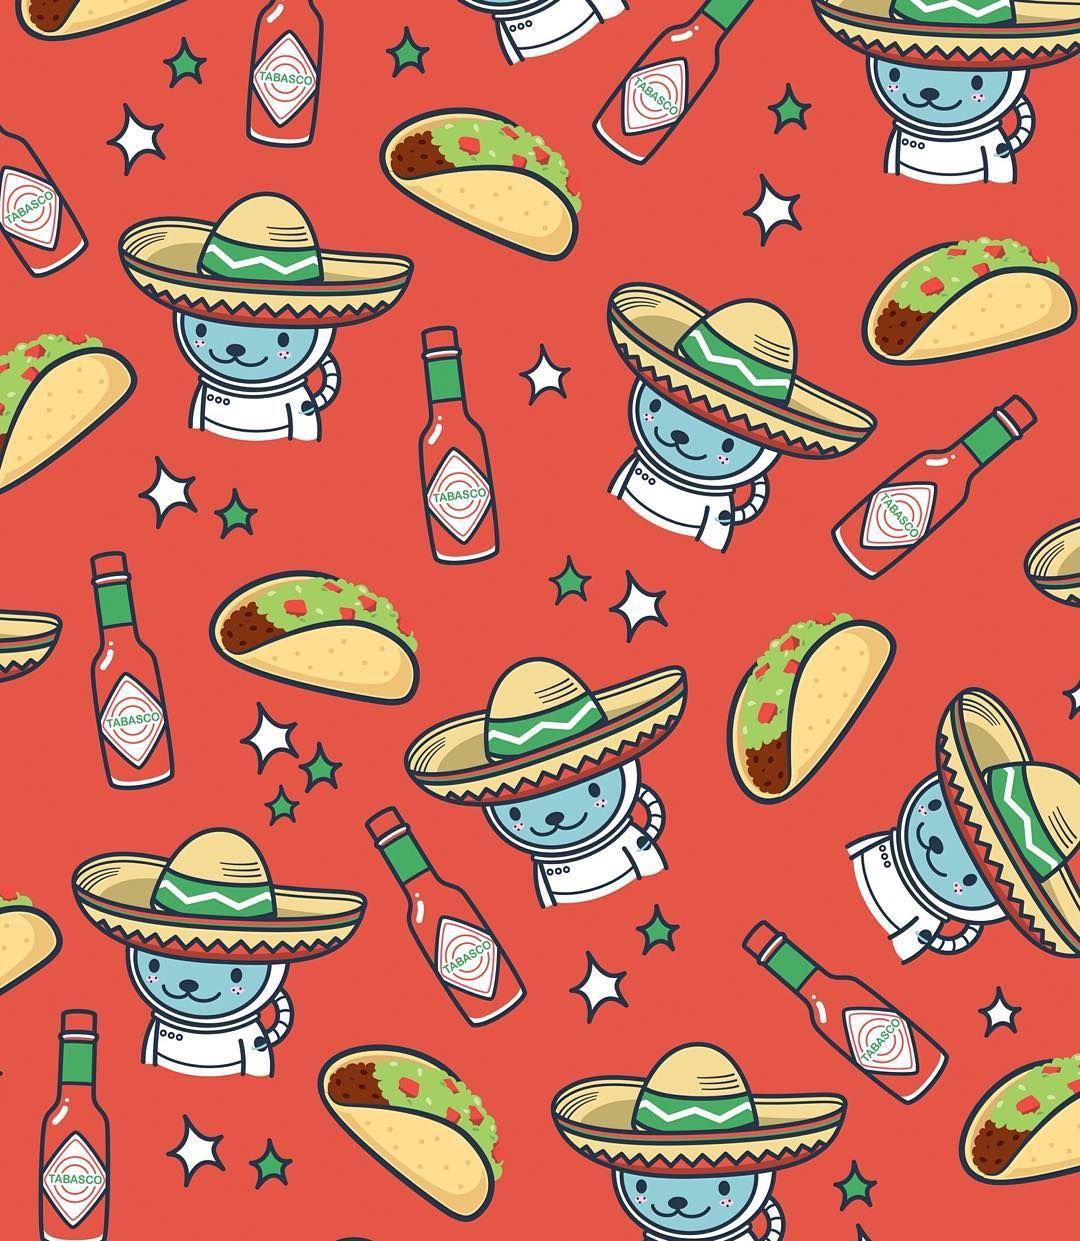 Jōkukuma On Instagram Mood For Tacos Tacos Burrito Mexico Cute Kawaii Spacebear Illustration Pattern Tacos Kawaii Food Patterns